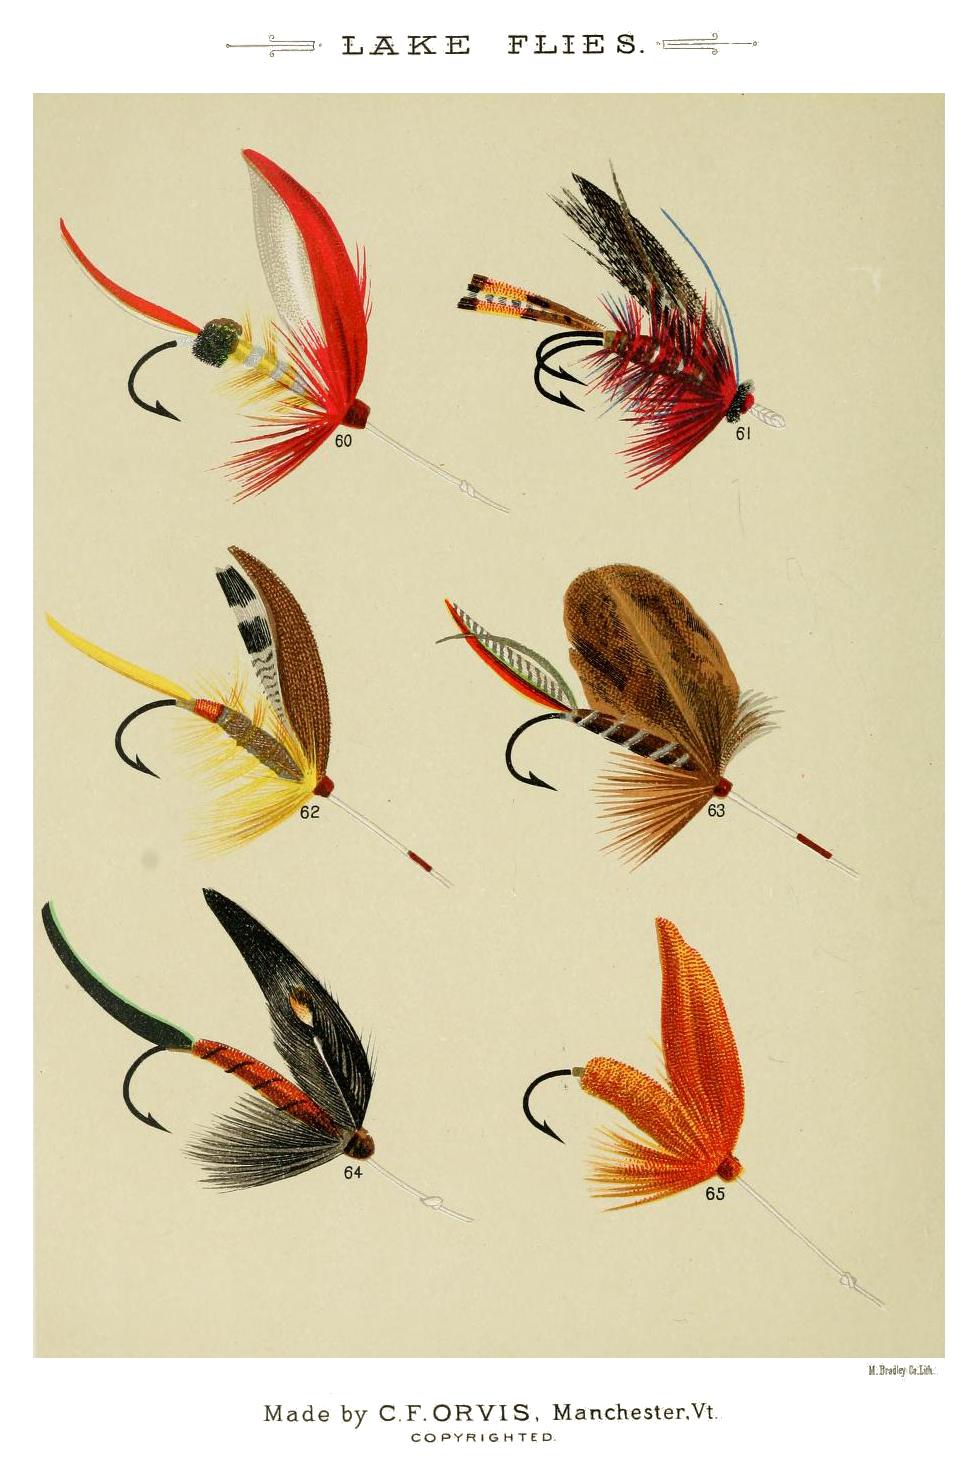 60. Parmacheene Belle – 61. Nicholson – 62. Nameless – 63. Cunningham – 64. Lord Baltimore – 65. Orange Miller